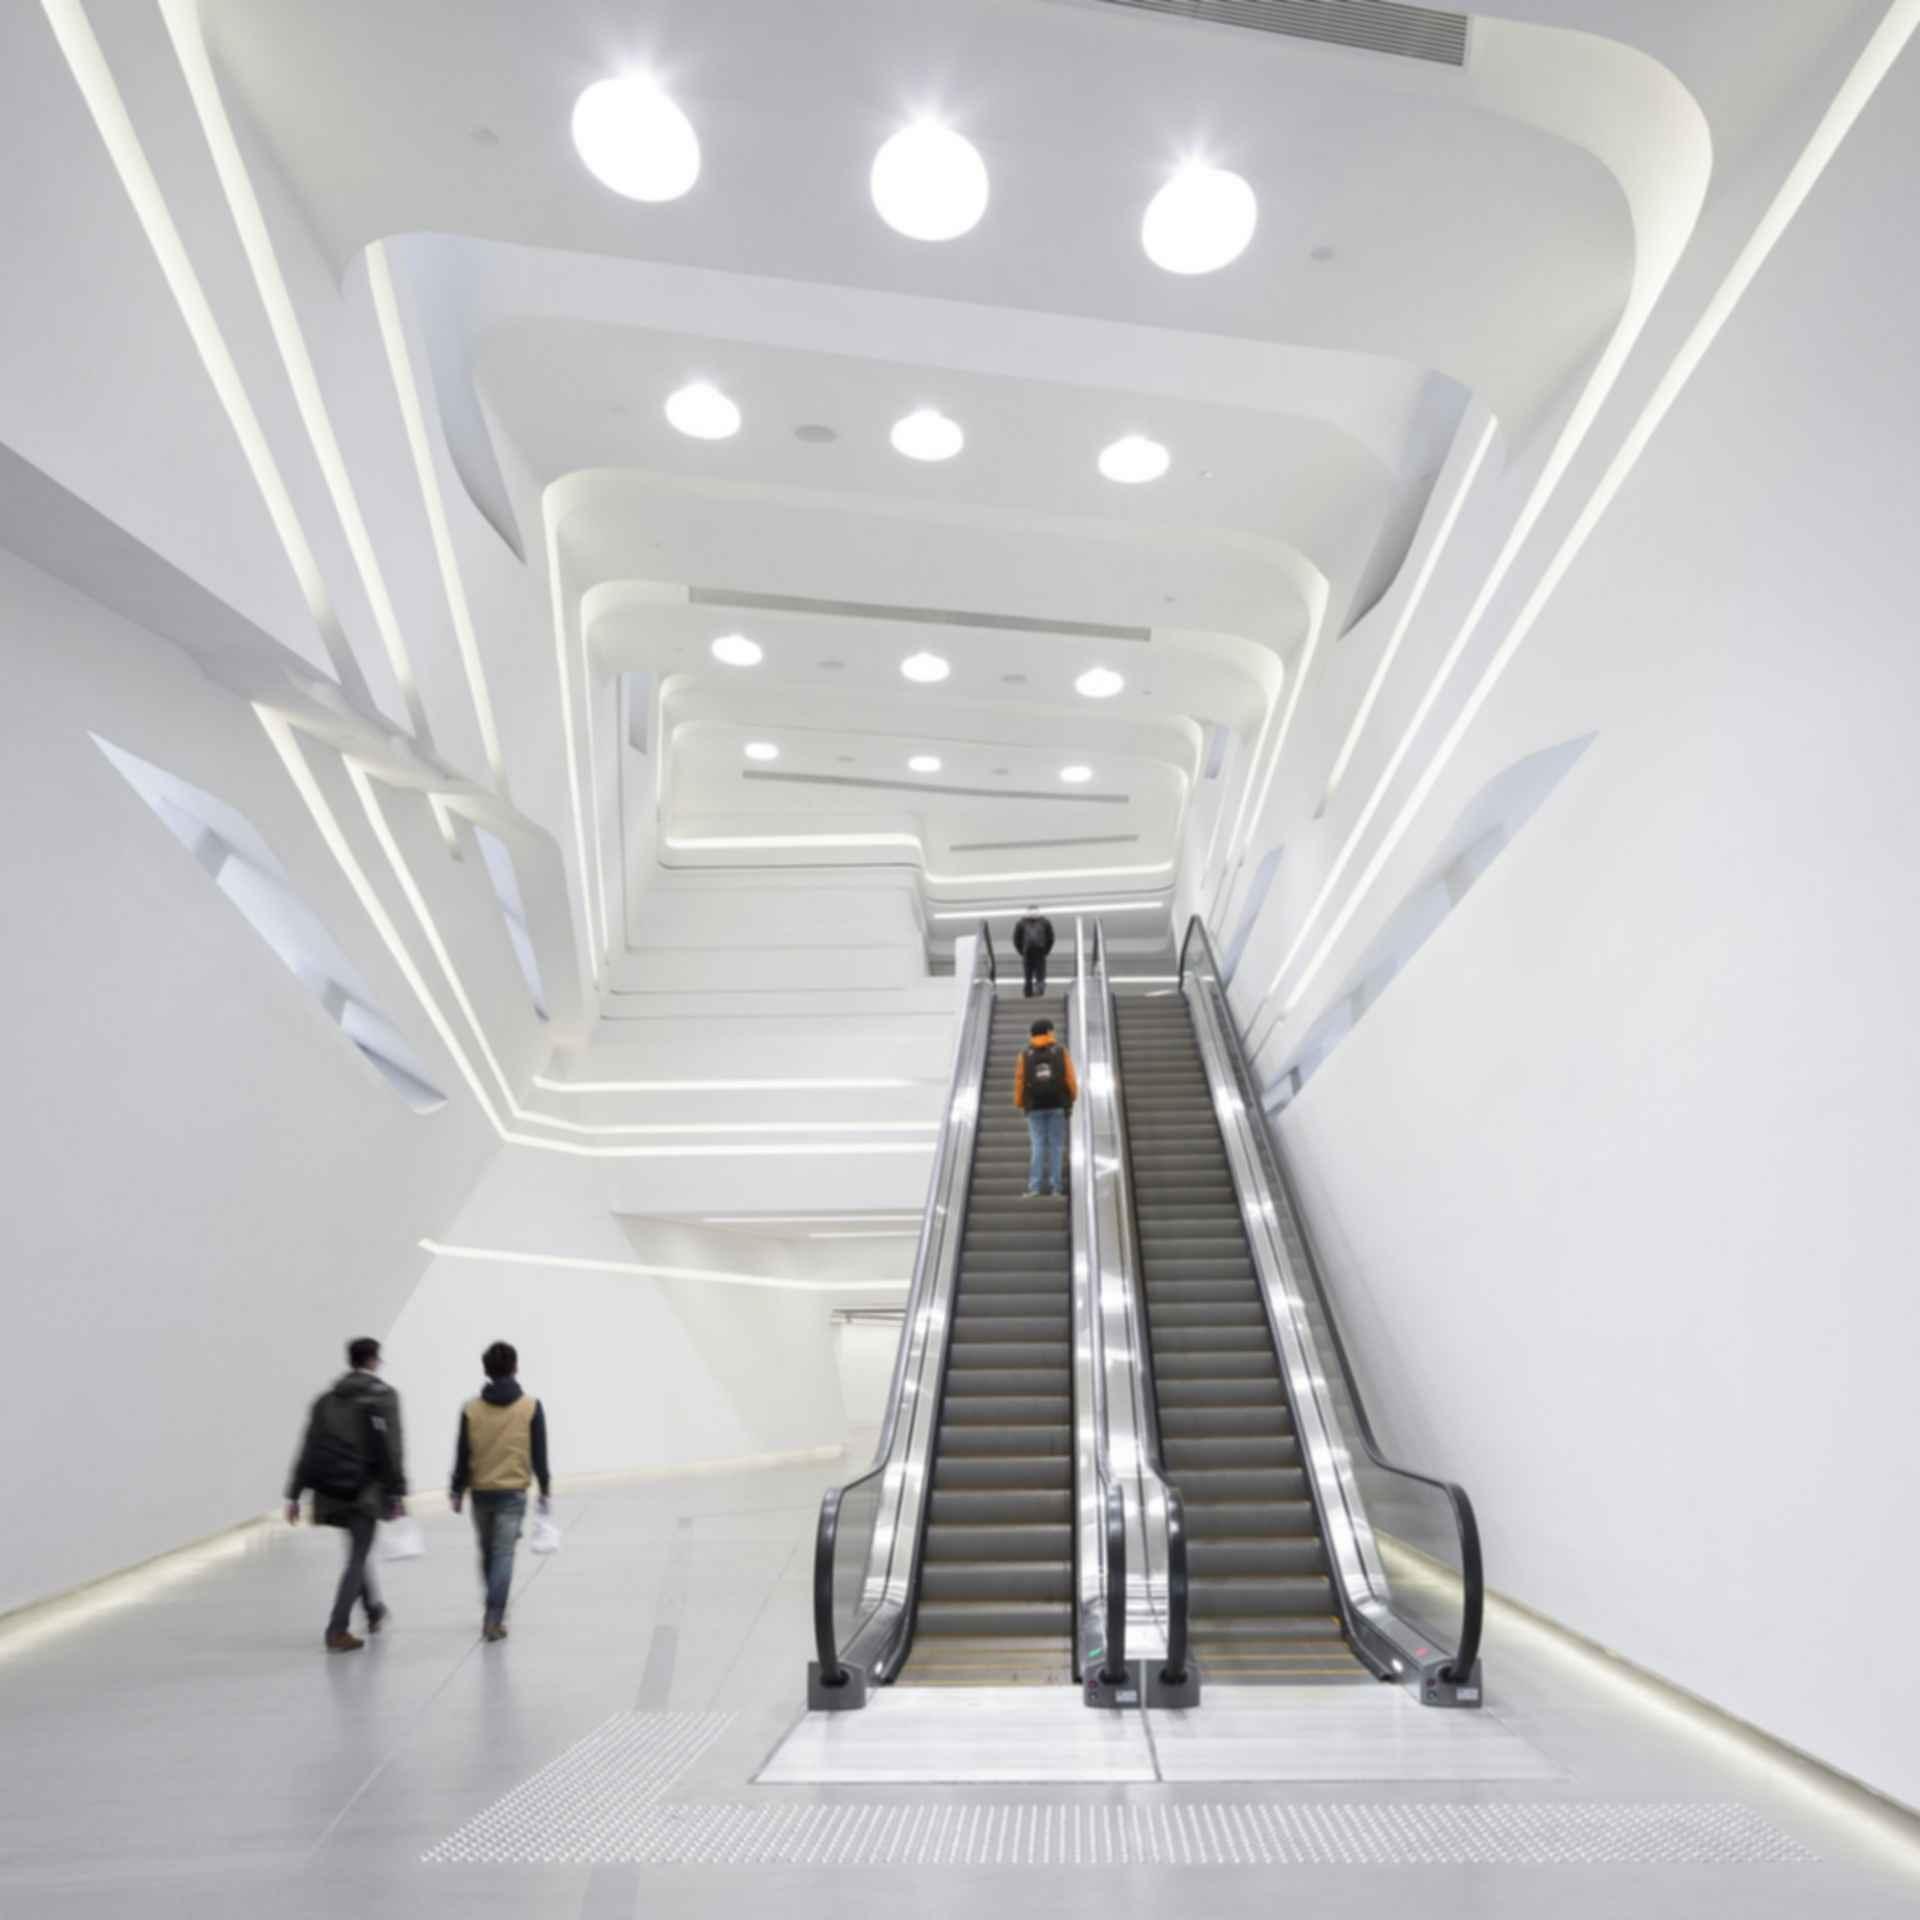 Jockey Club Innovation Tower (JCIT) - Interior/Escalator